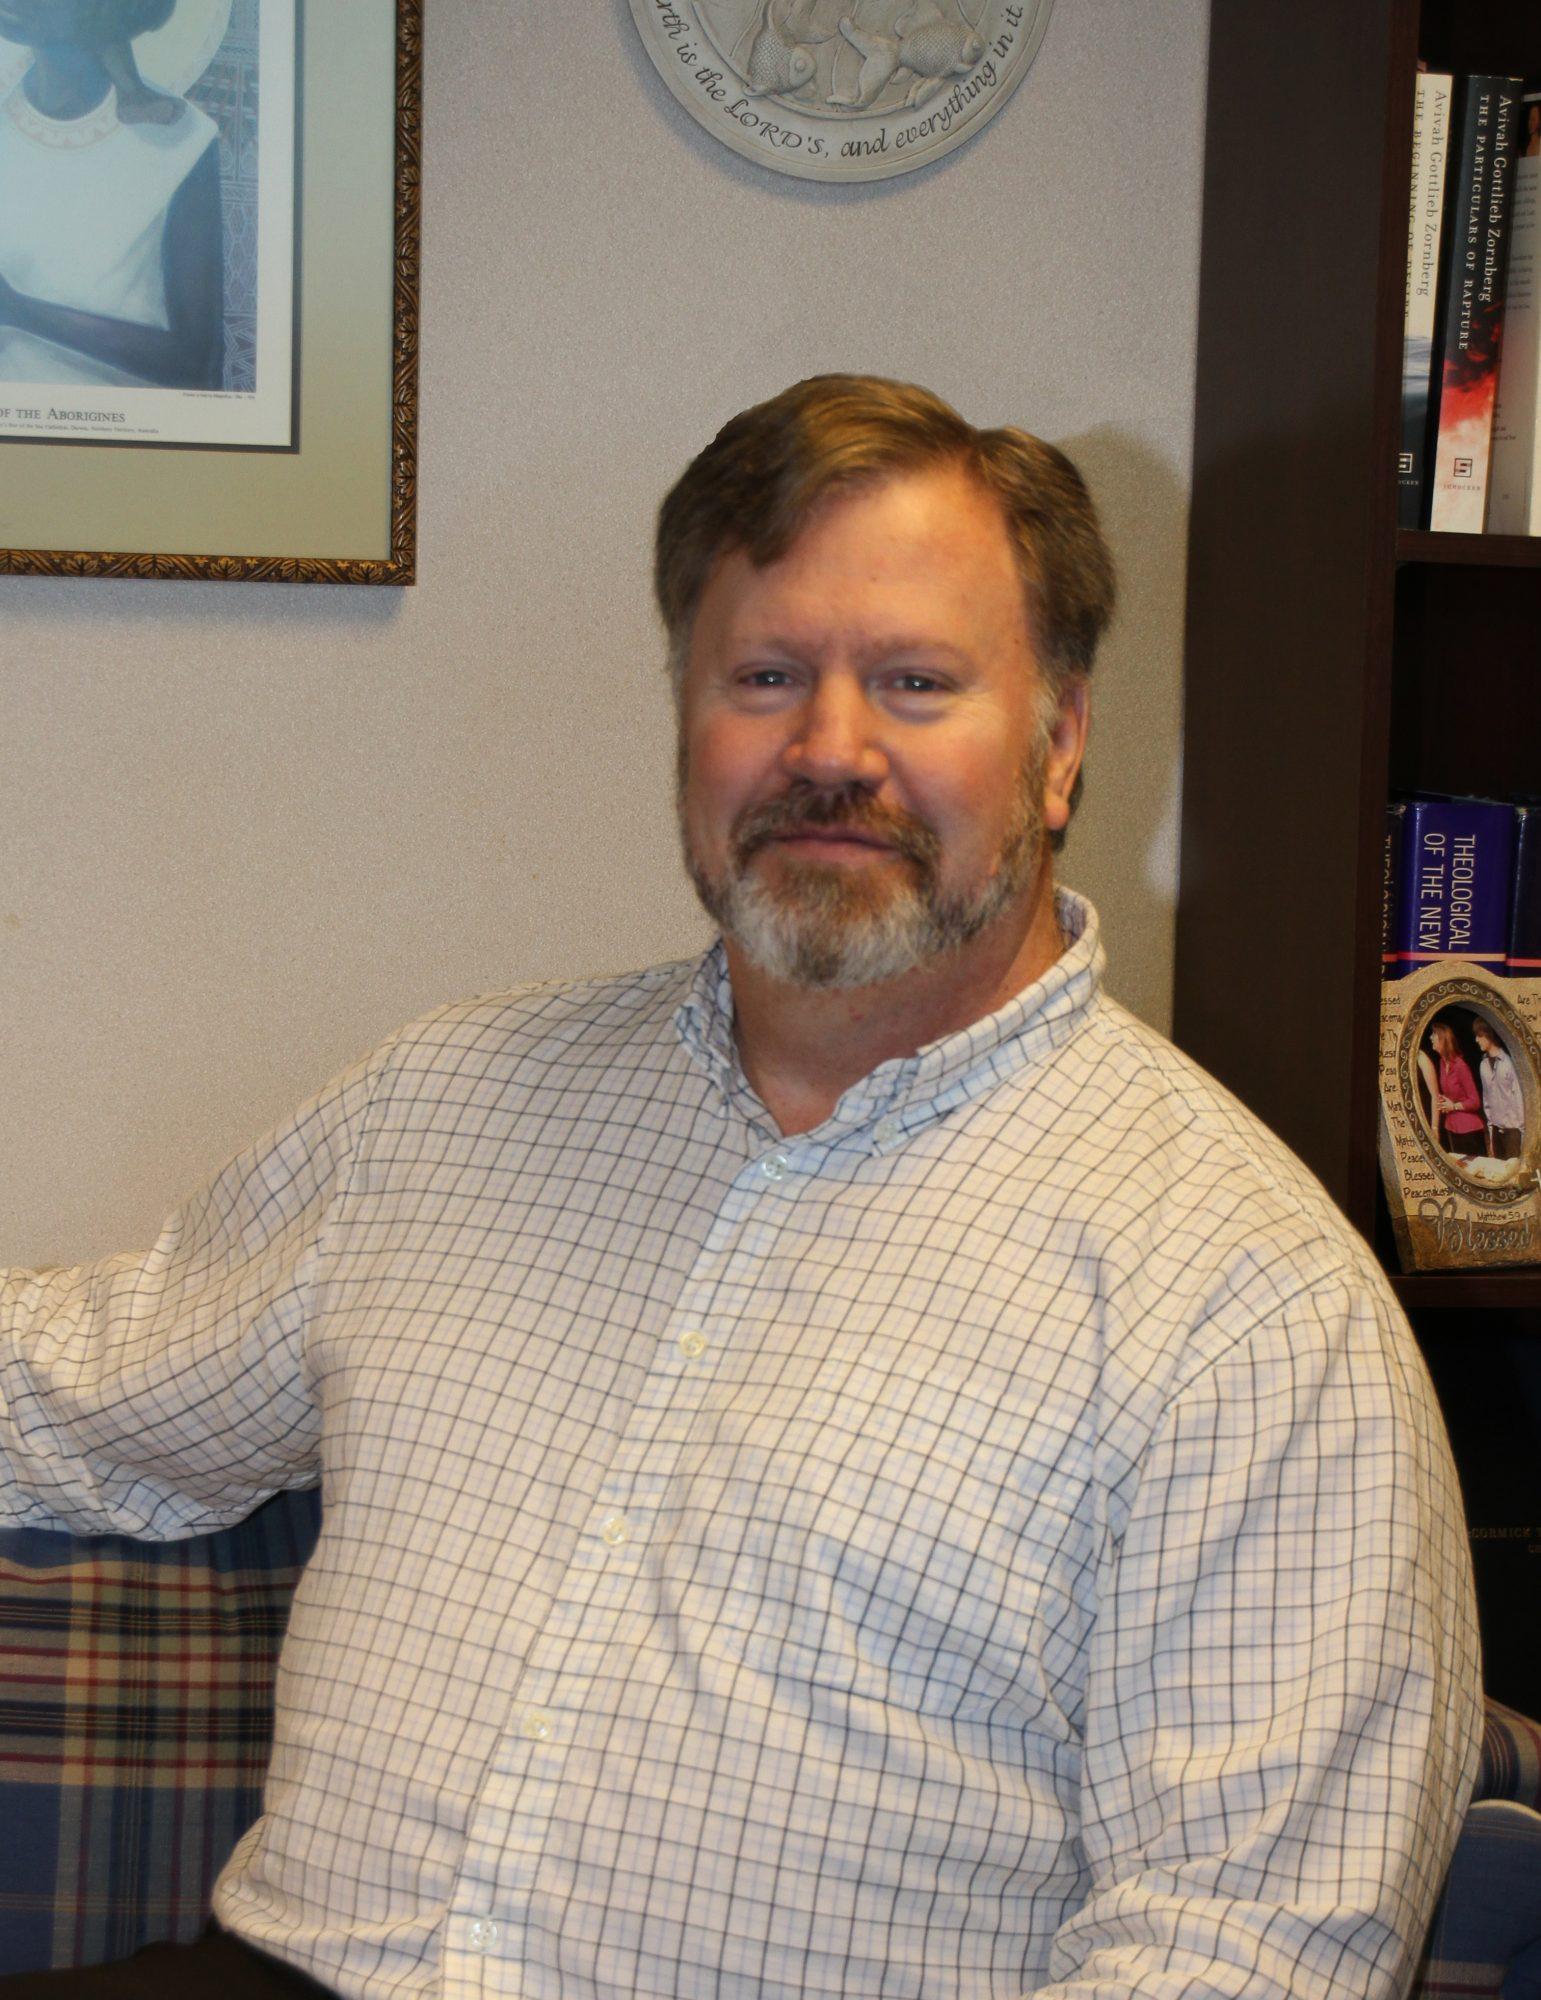 ST. ANDREWS PRESBYTERIAN CHURCH - Michael Beery, Director of Music